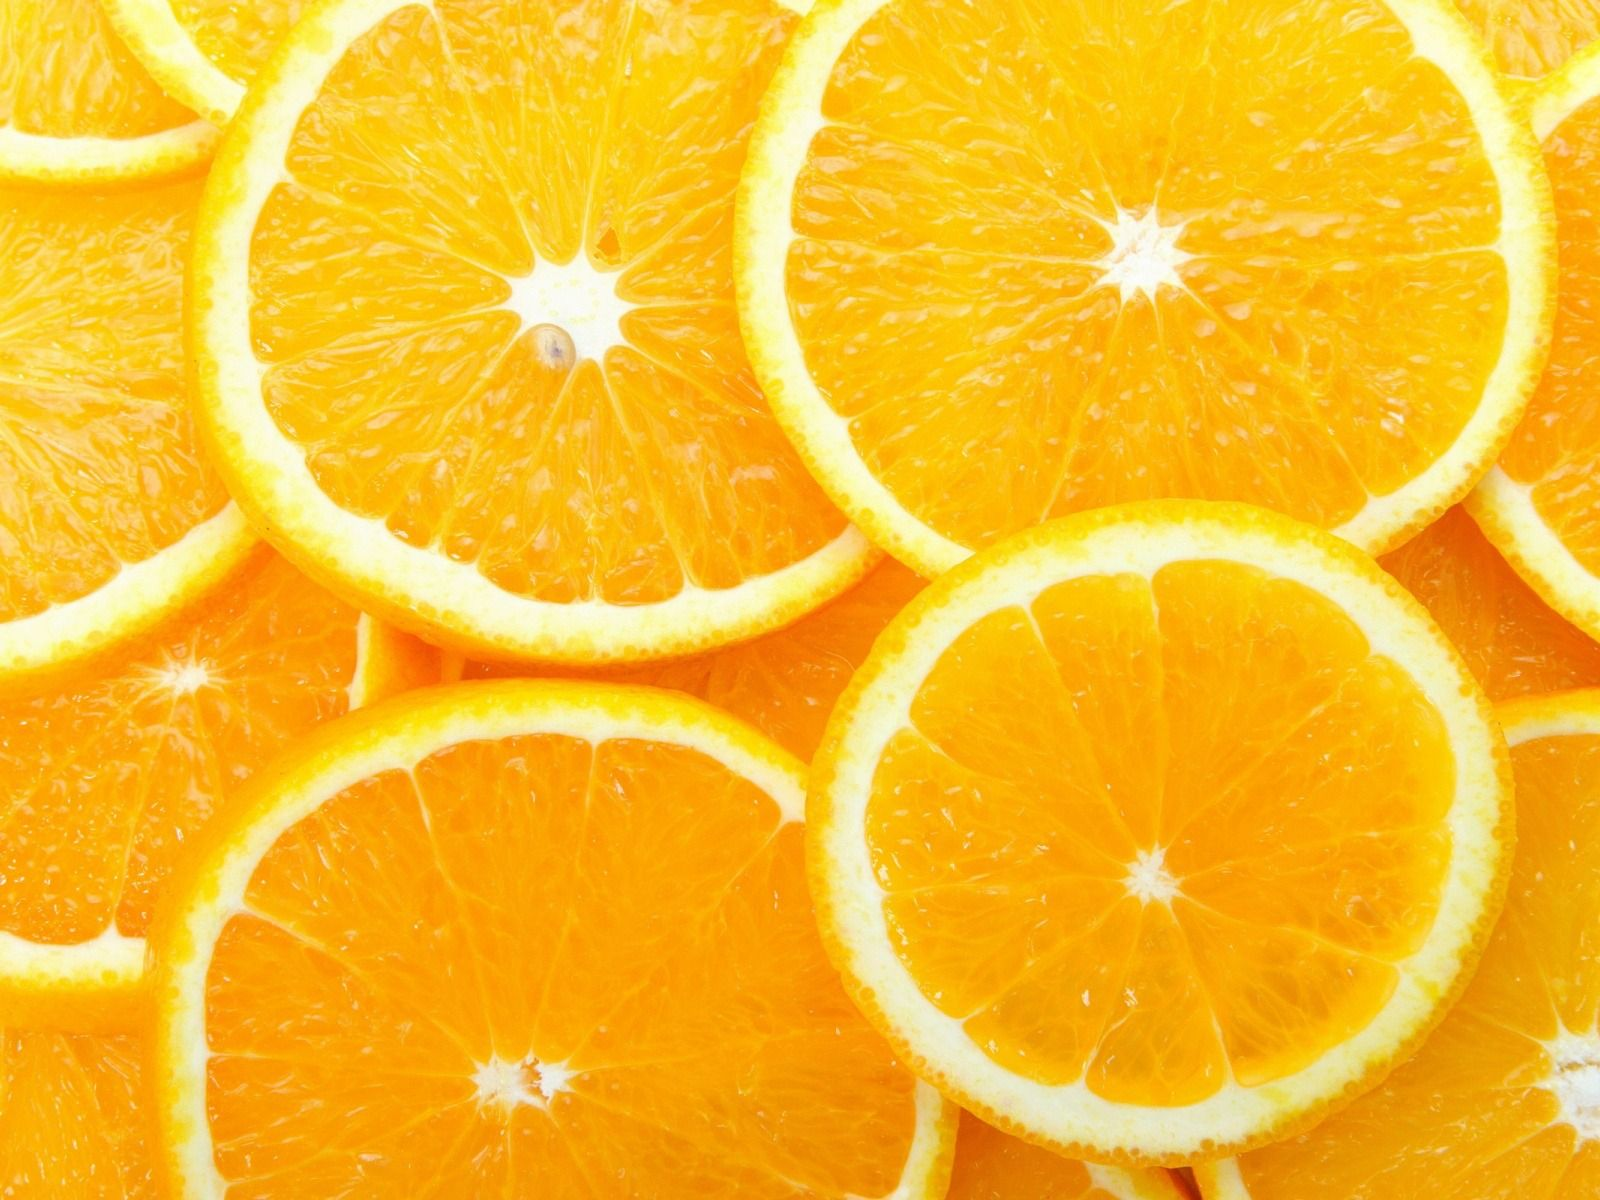 Fresh fruits wallpaper high resolution - Flower With Orange Fruit Hd Wallpaper Free Download